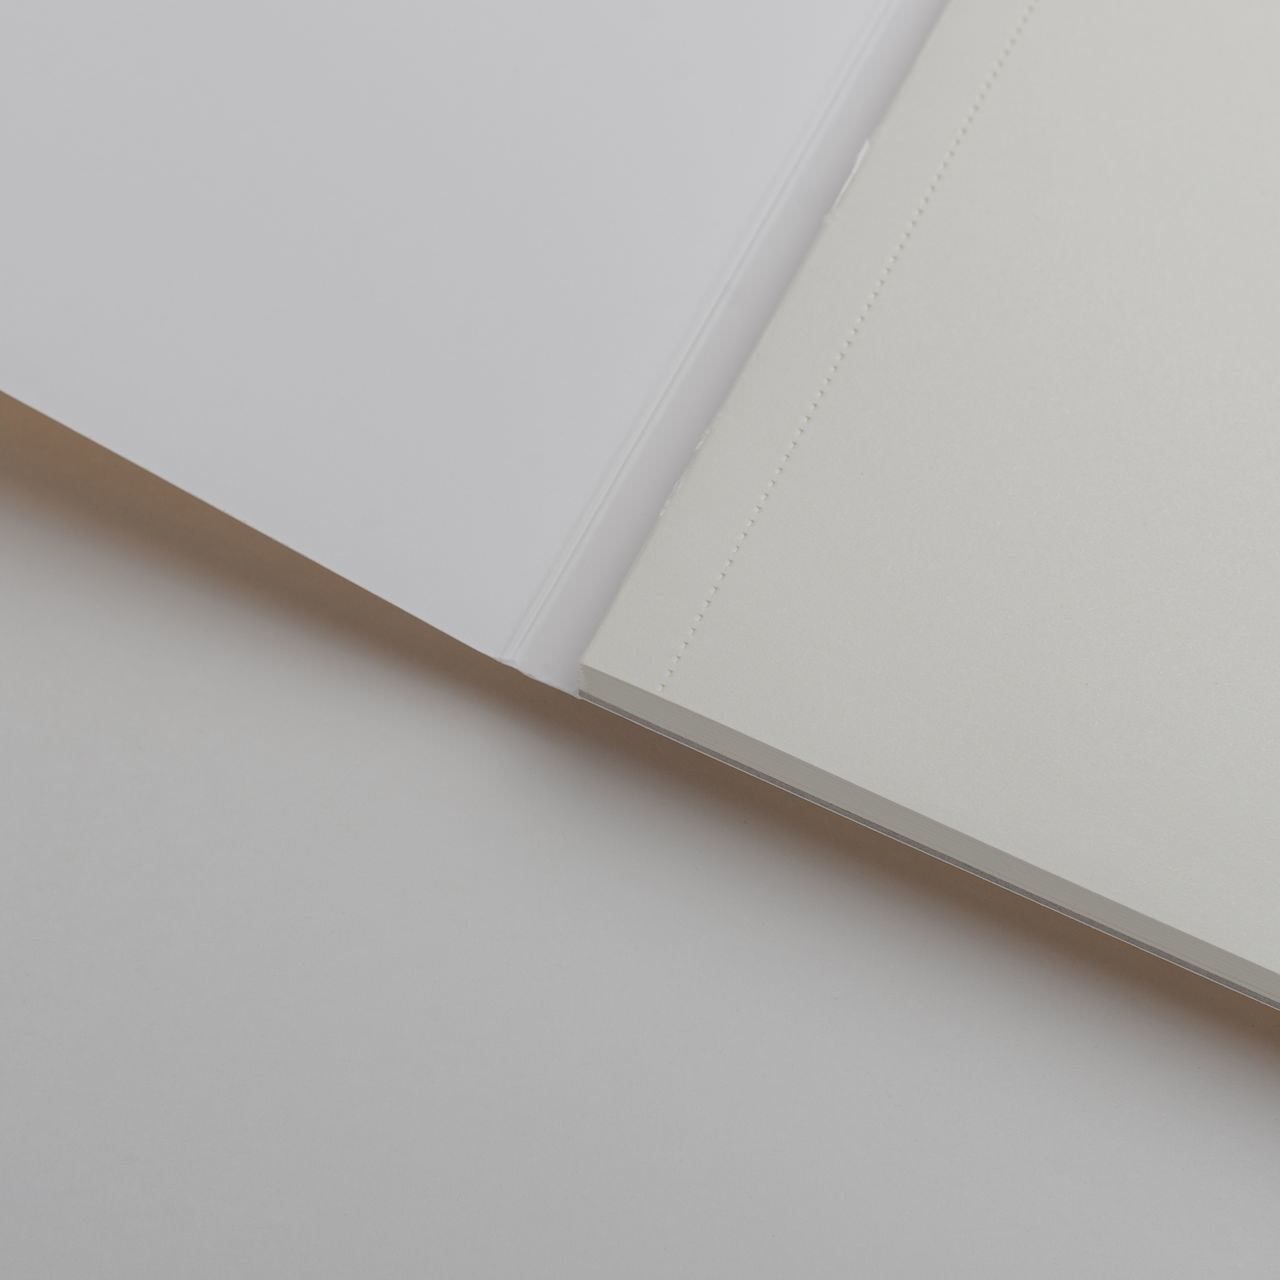 A5 Золотой скетчбук с перфорацией Falafel books Sketchbook Gold